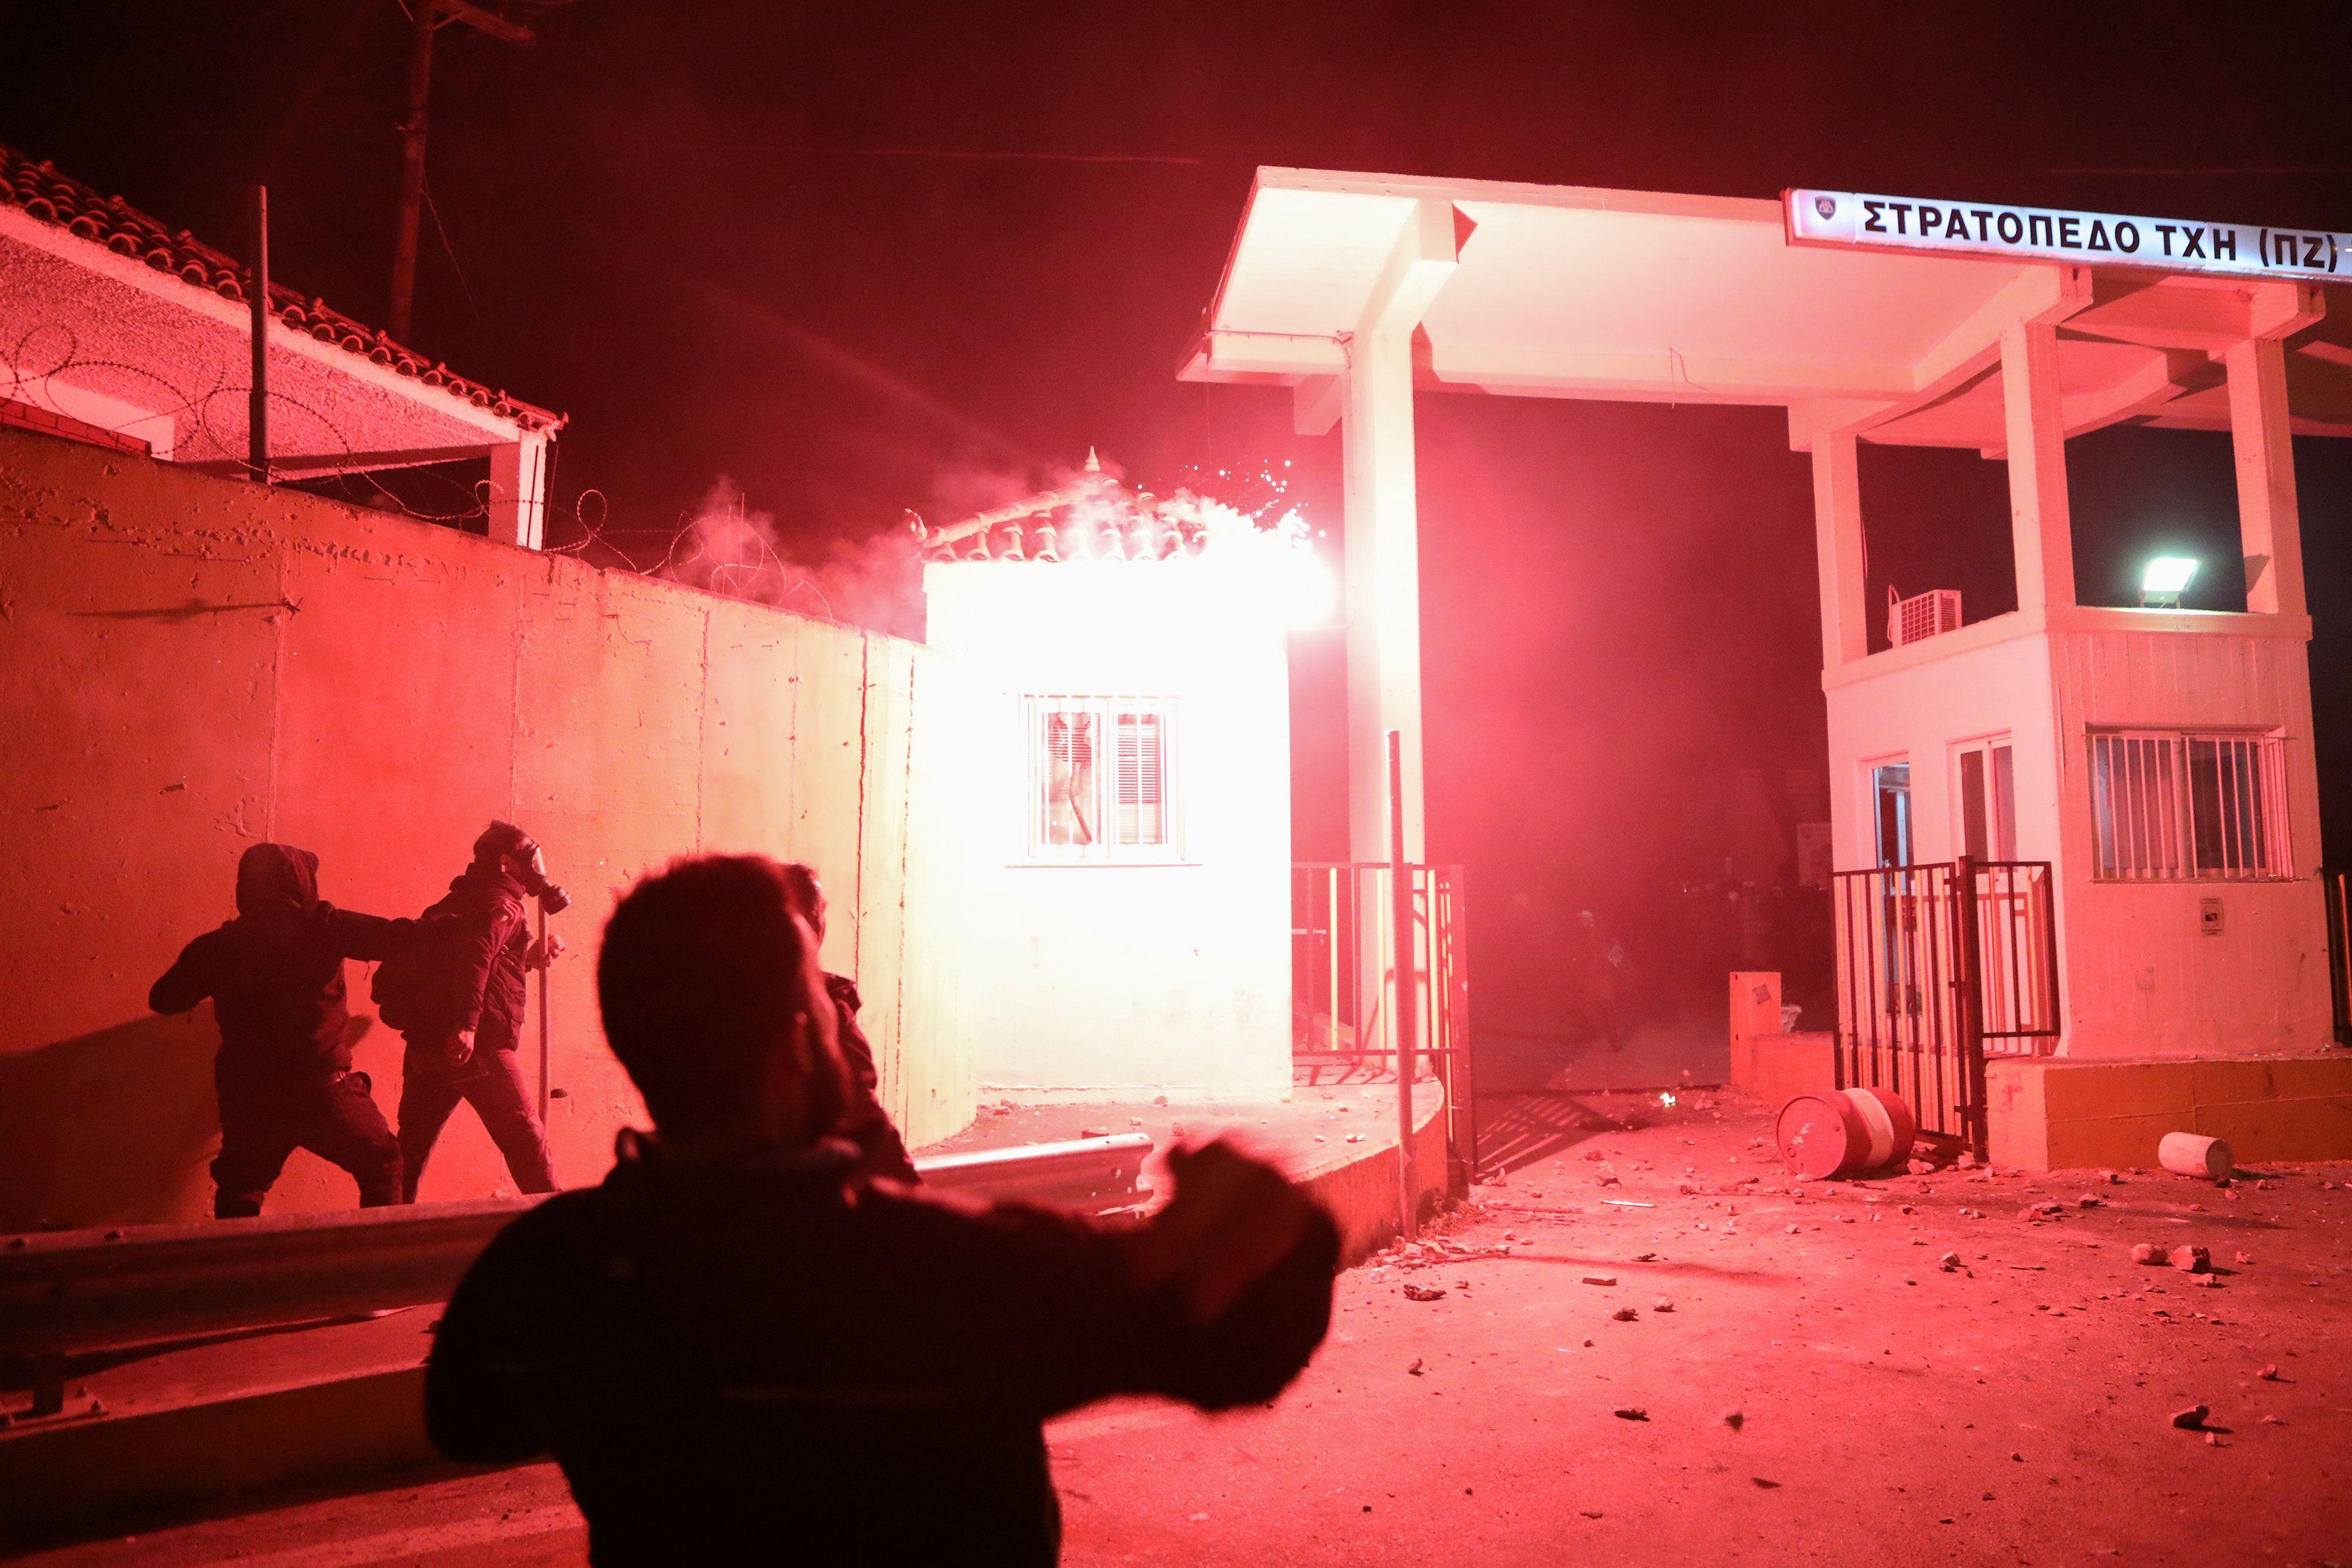 What We're Watching: Haiti & Greece protests, Venezuela on film, Afghan women's prisons